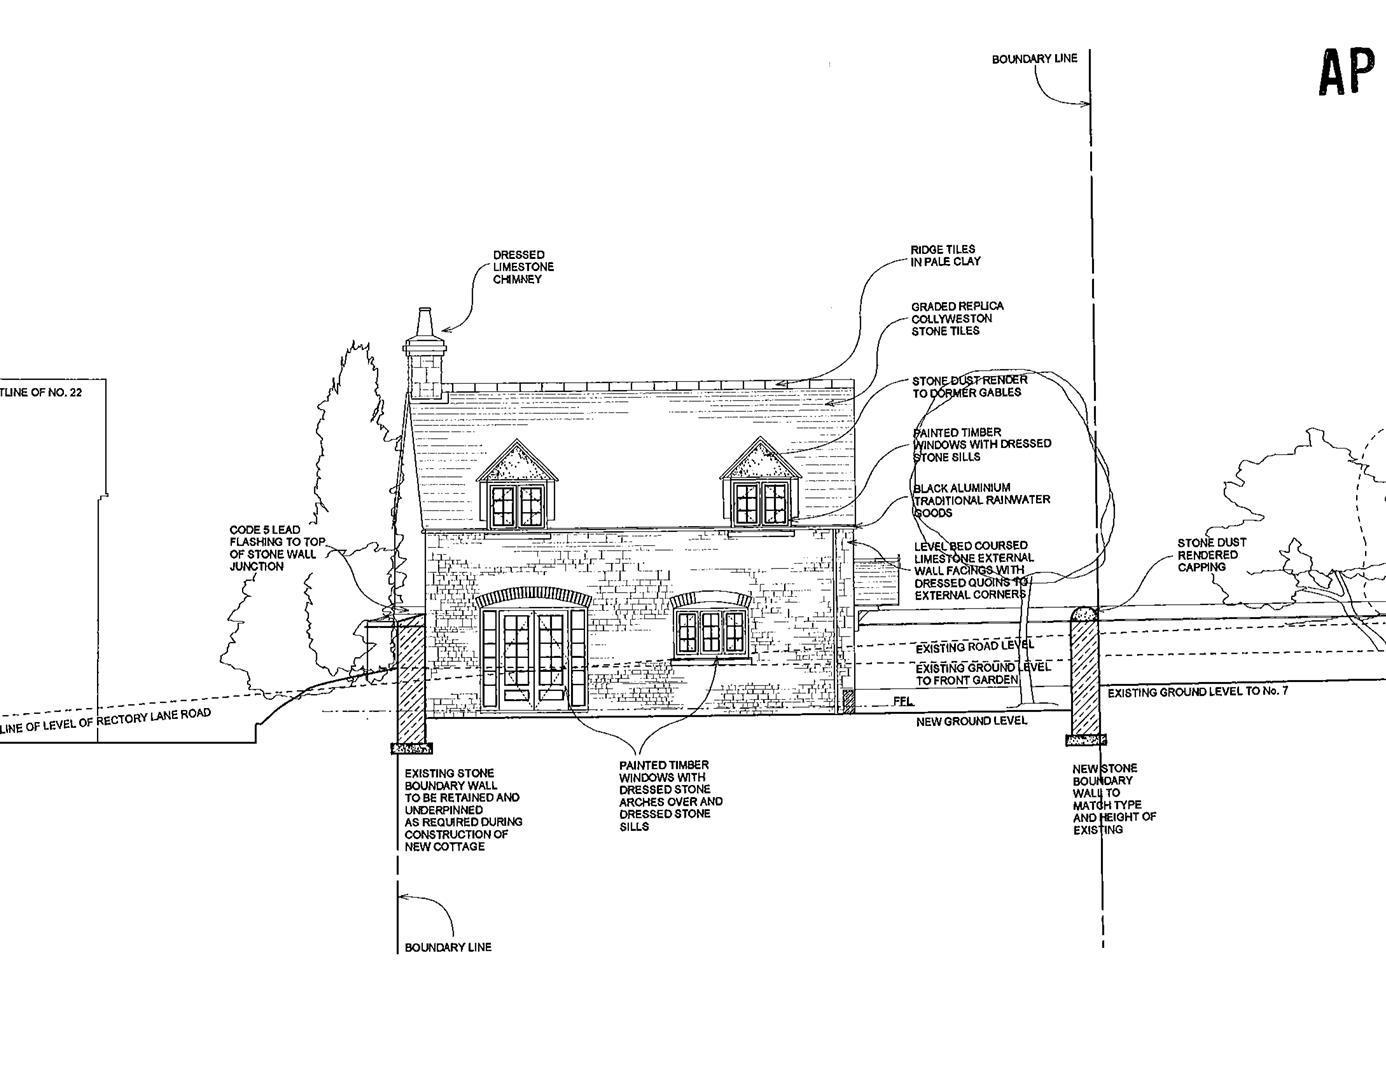 Property for sale in Rectory Lane, Edith Weston, Rutland